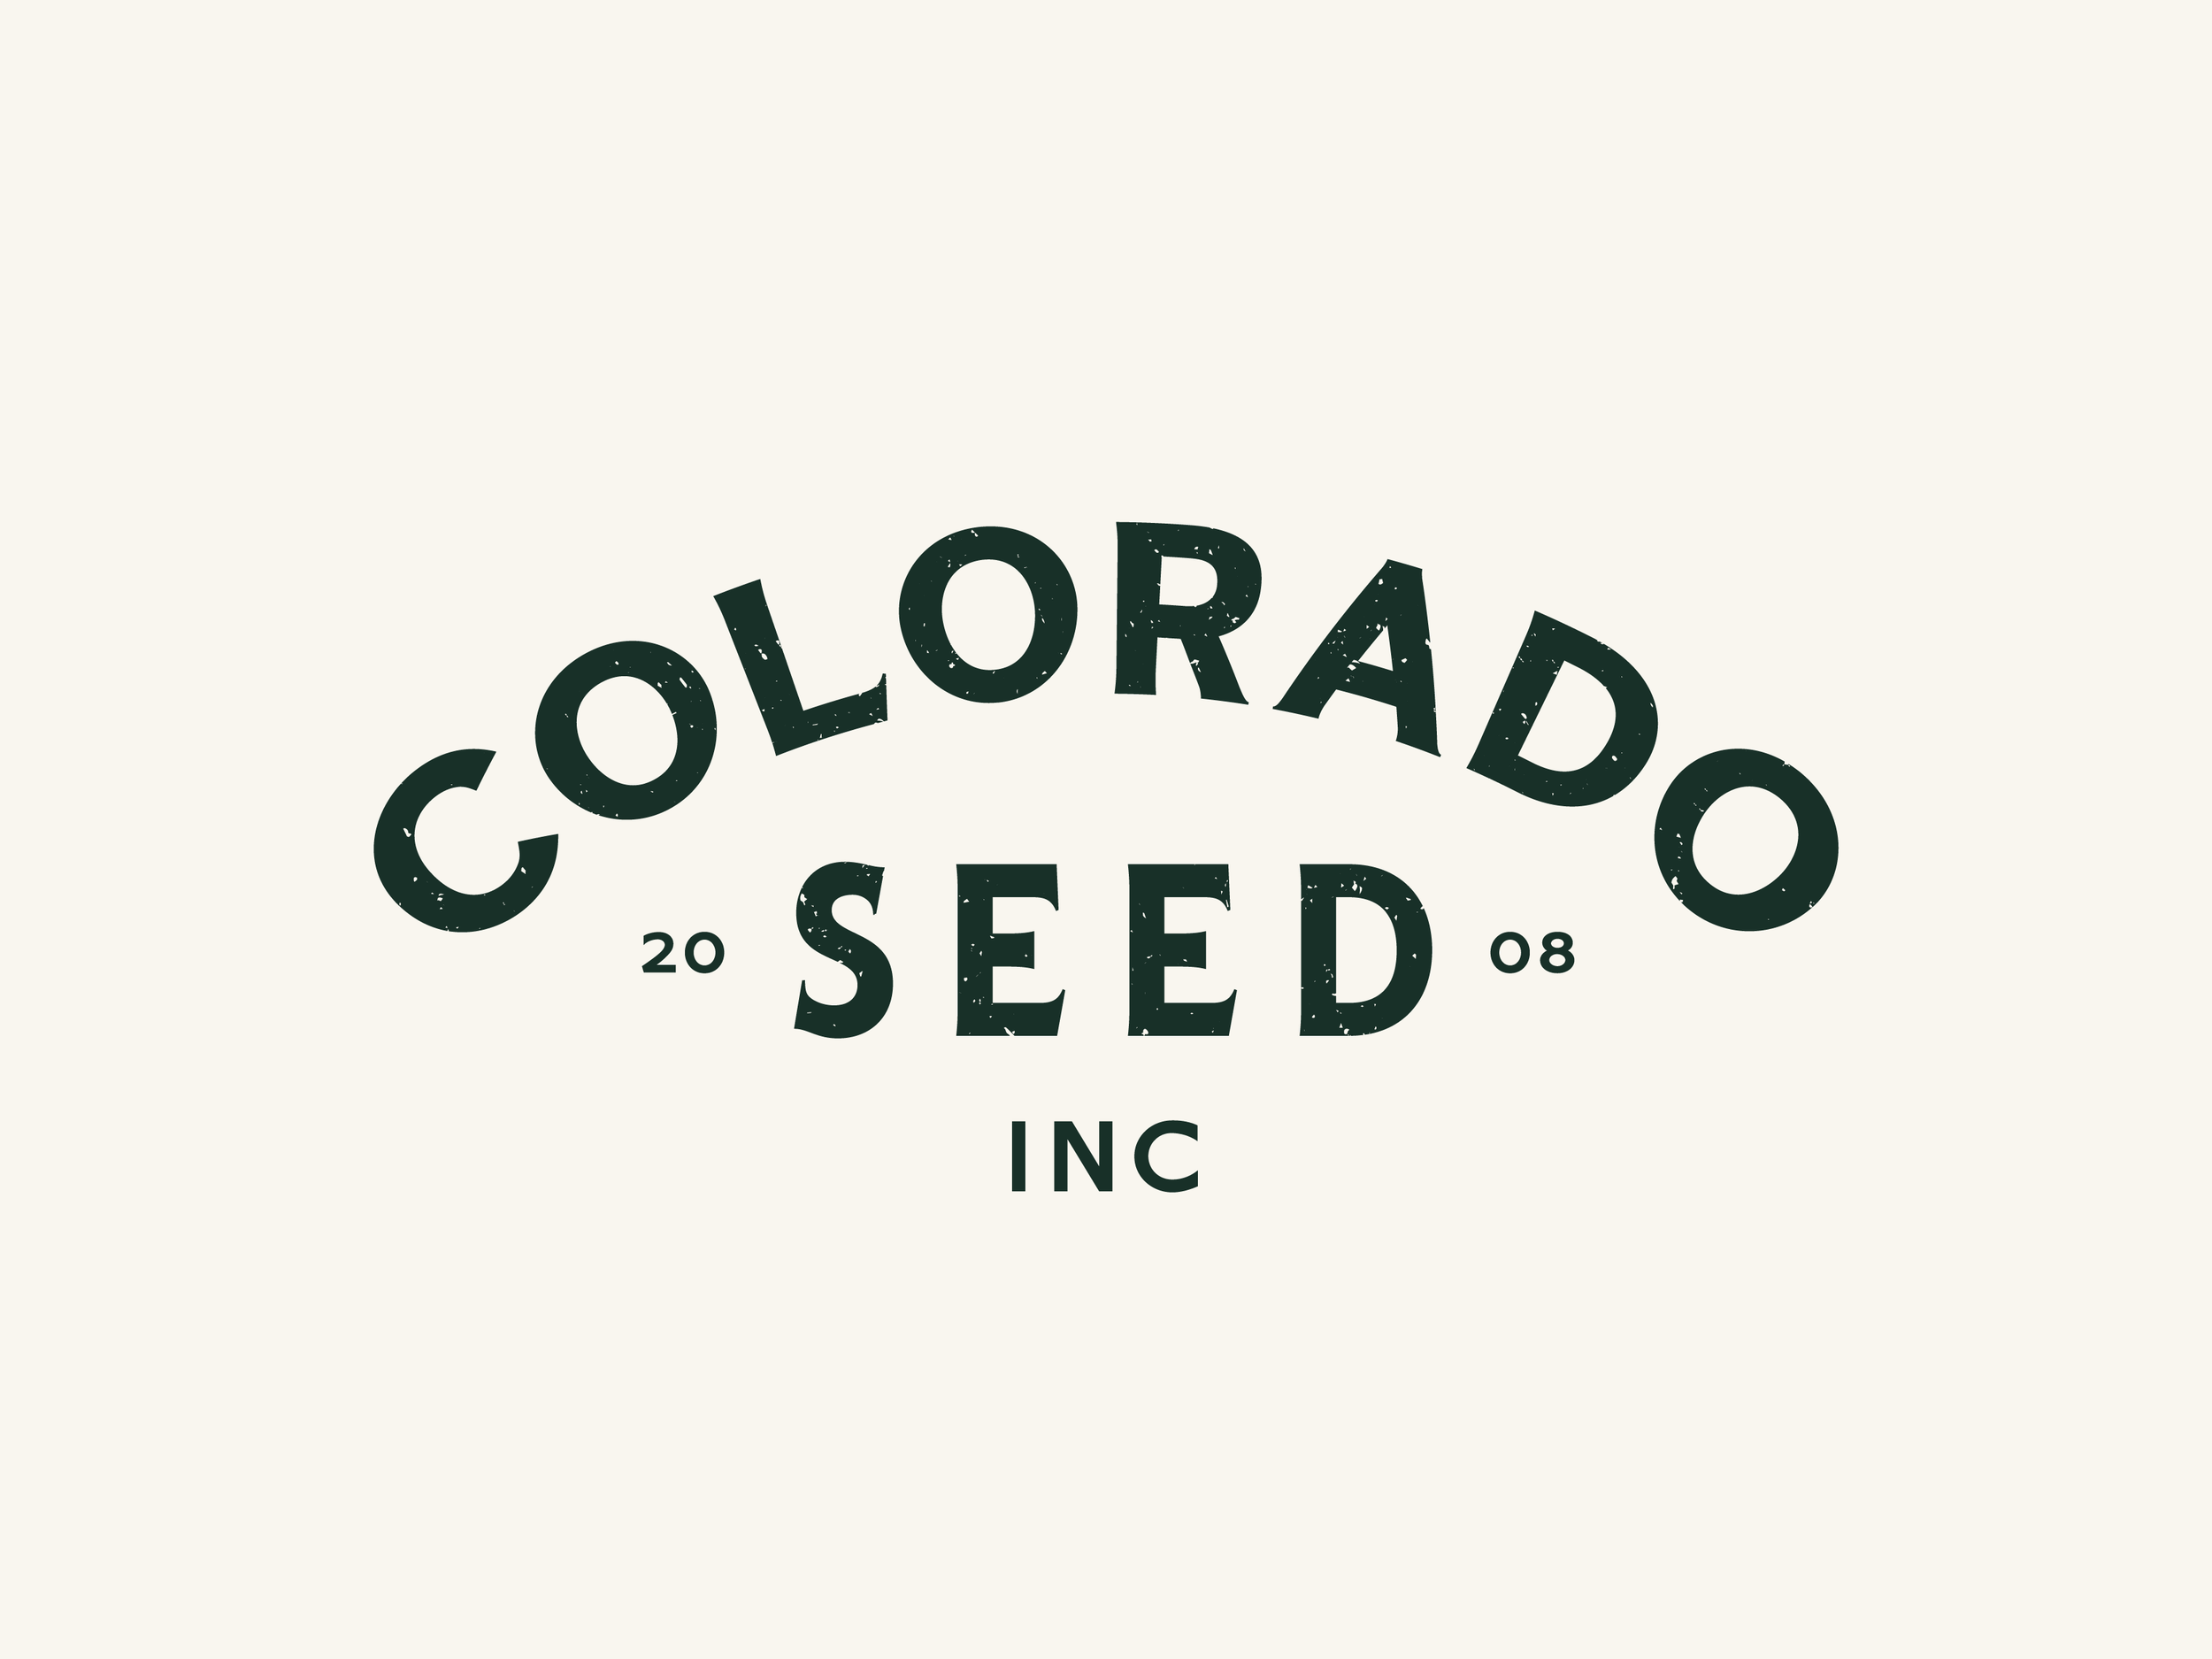 ColoradoSeed-Cannabis-Branding-Logo